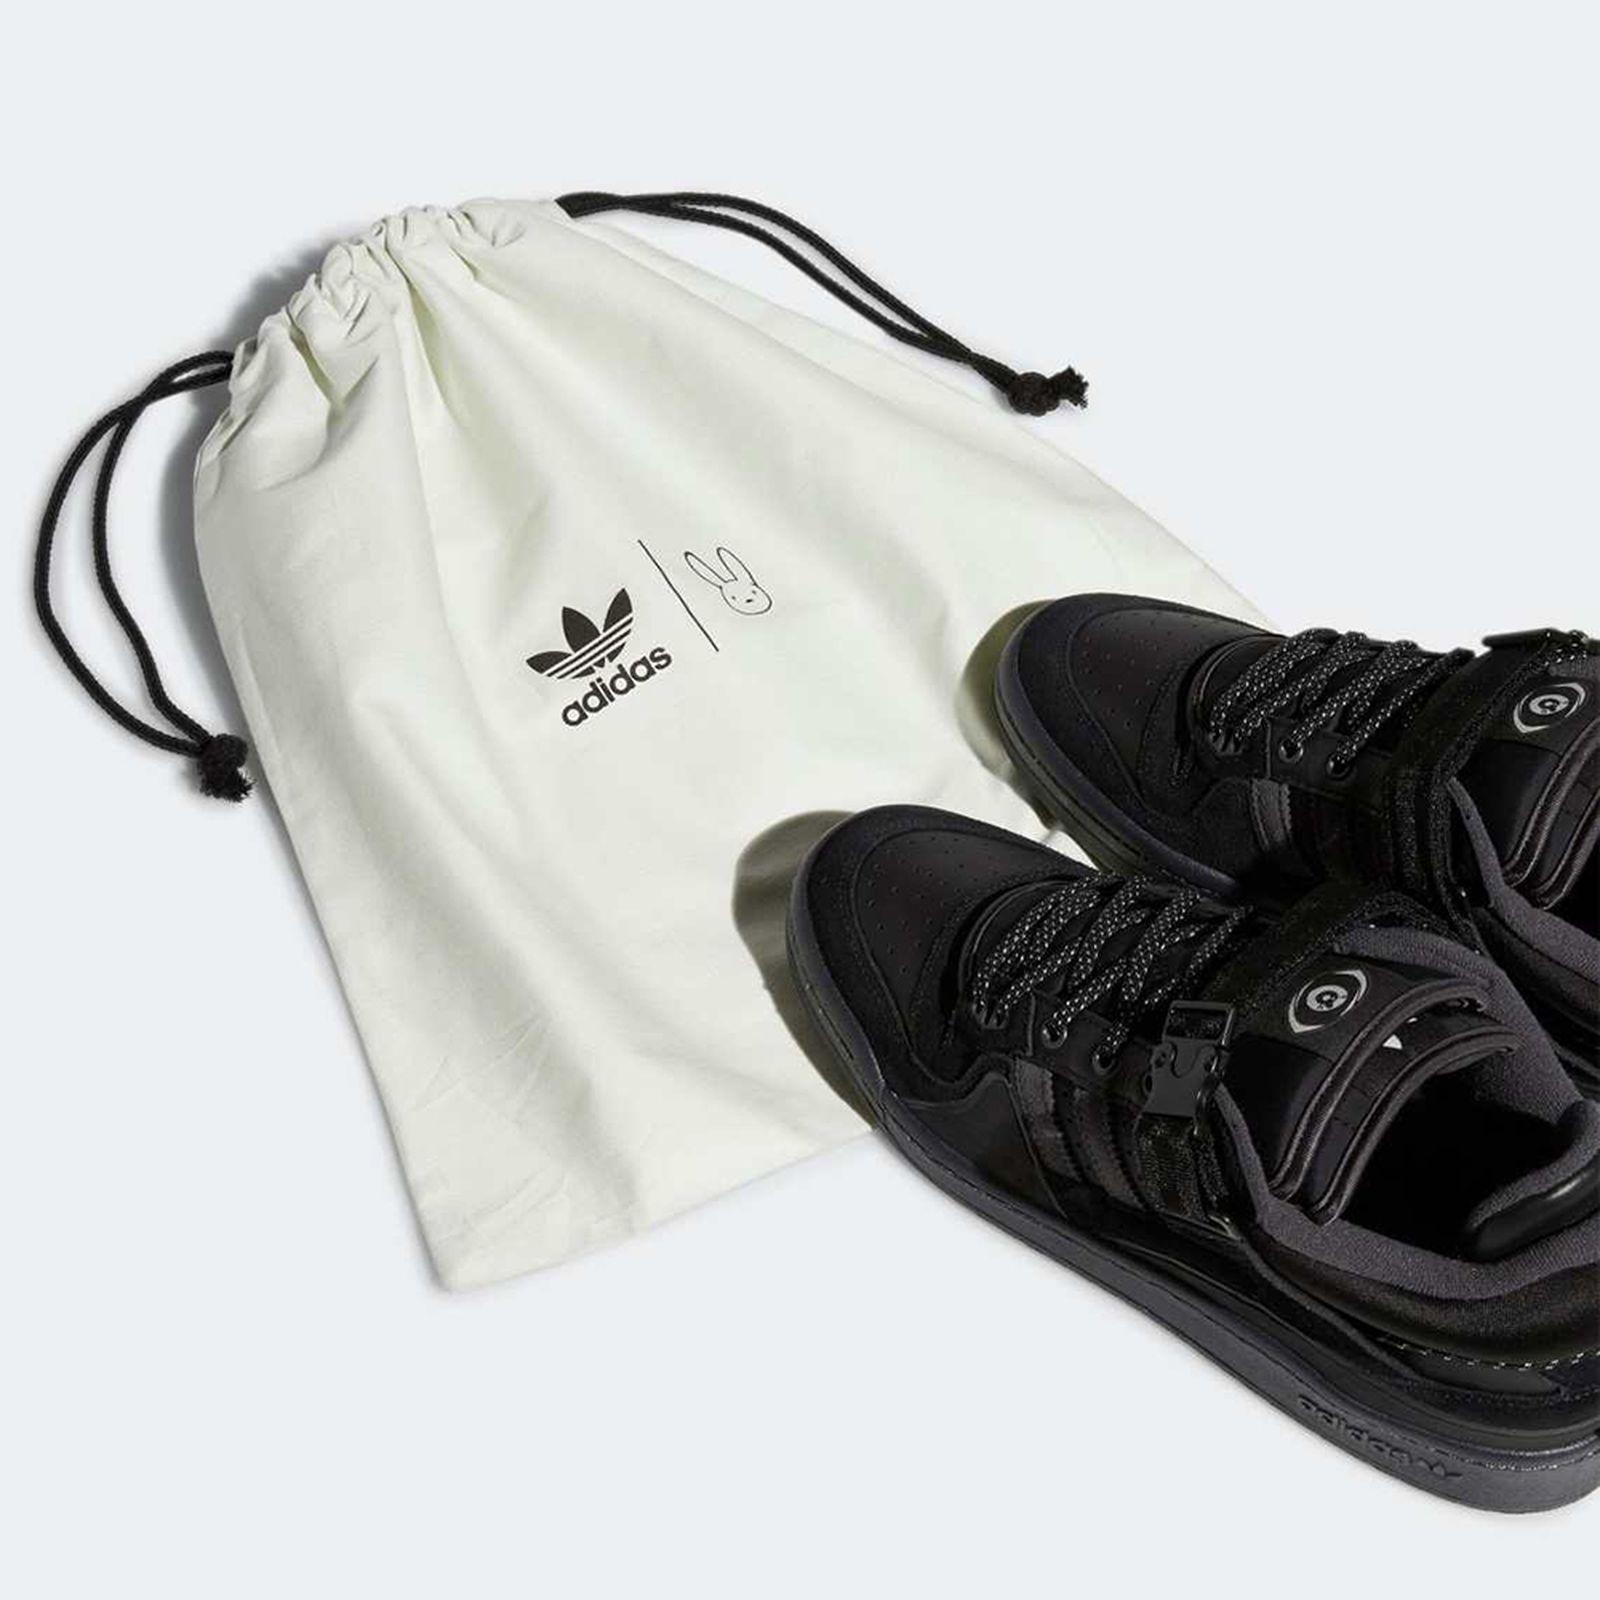 bad-bunny-adidas-originals-forum-low-triple-black-release-date-price-10